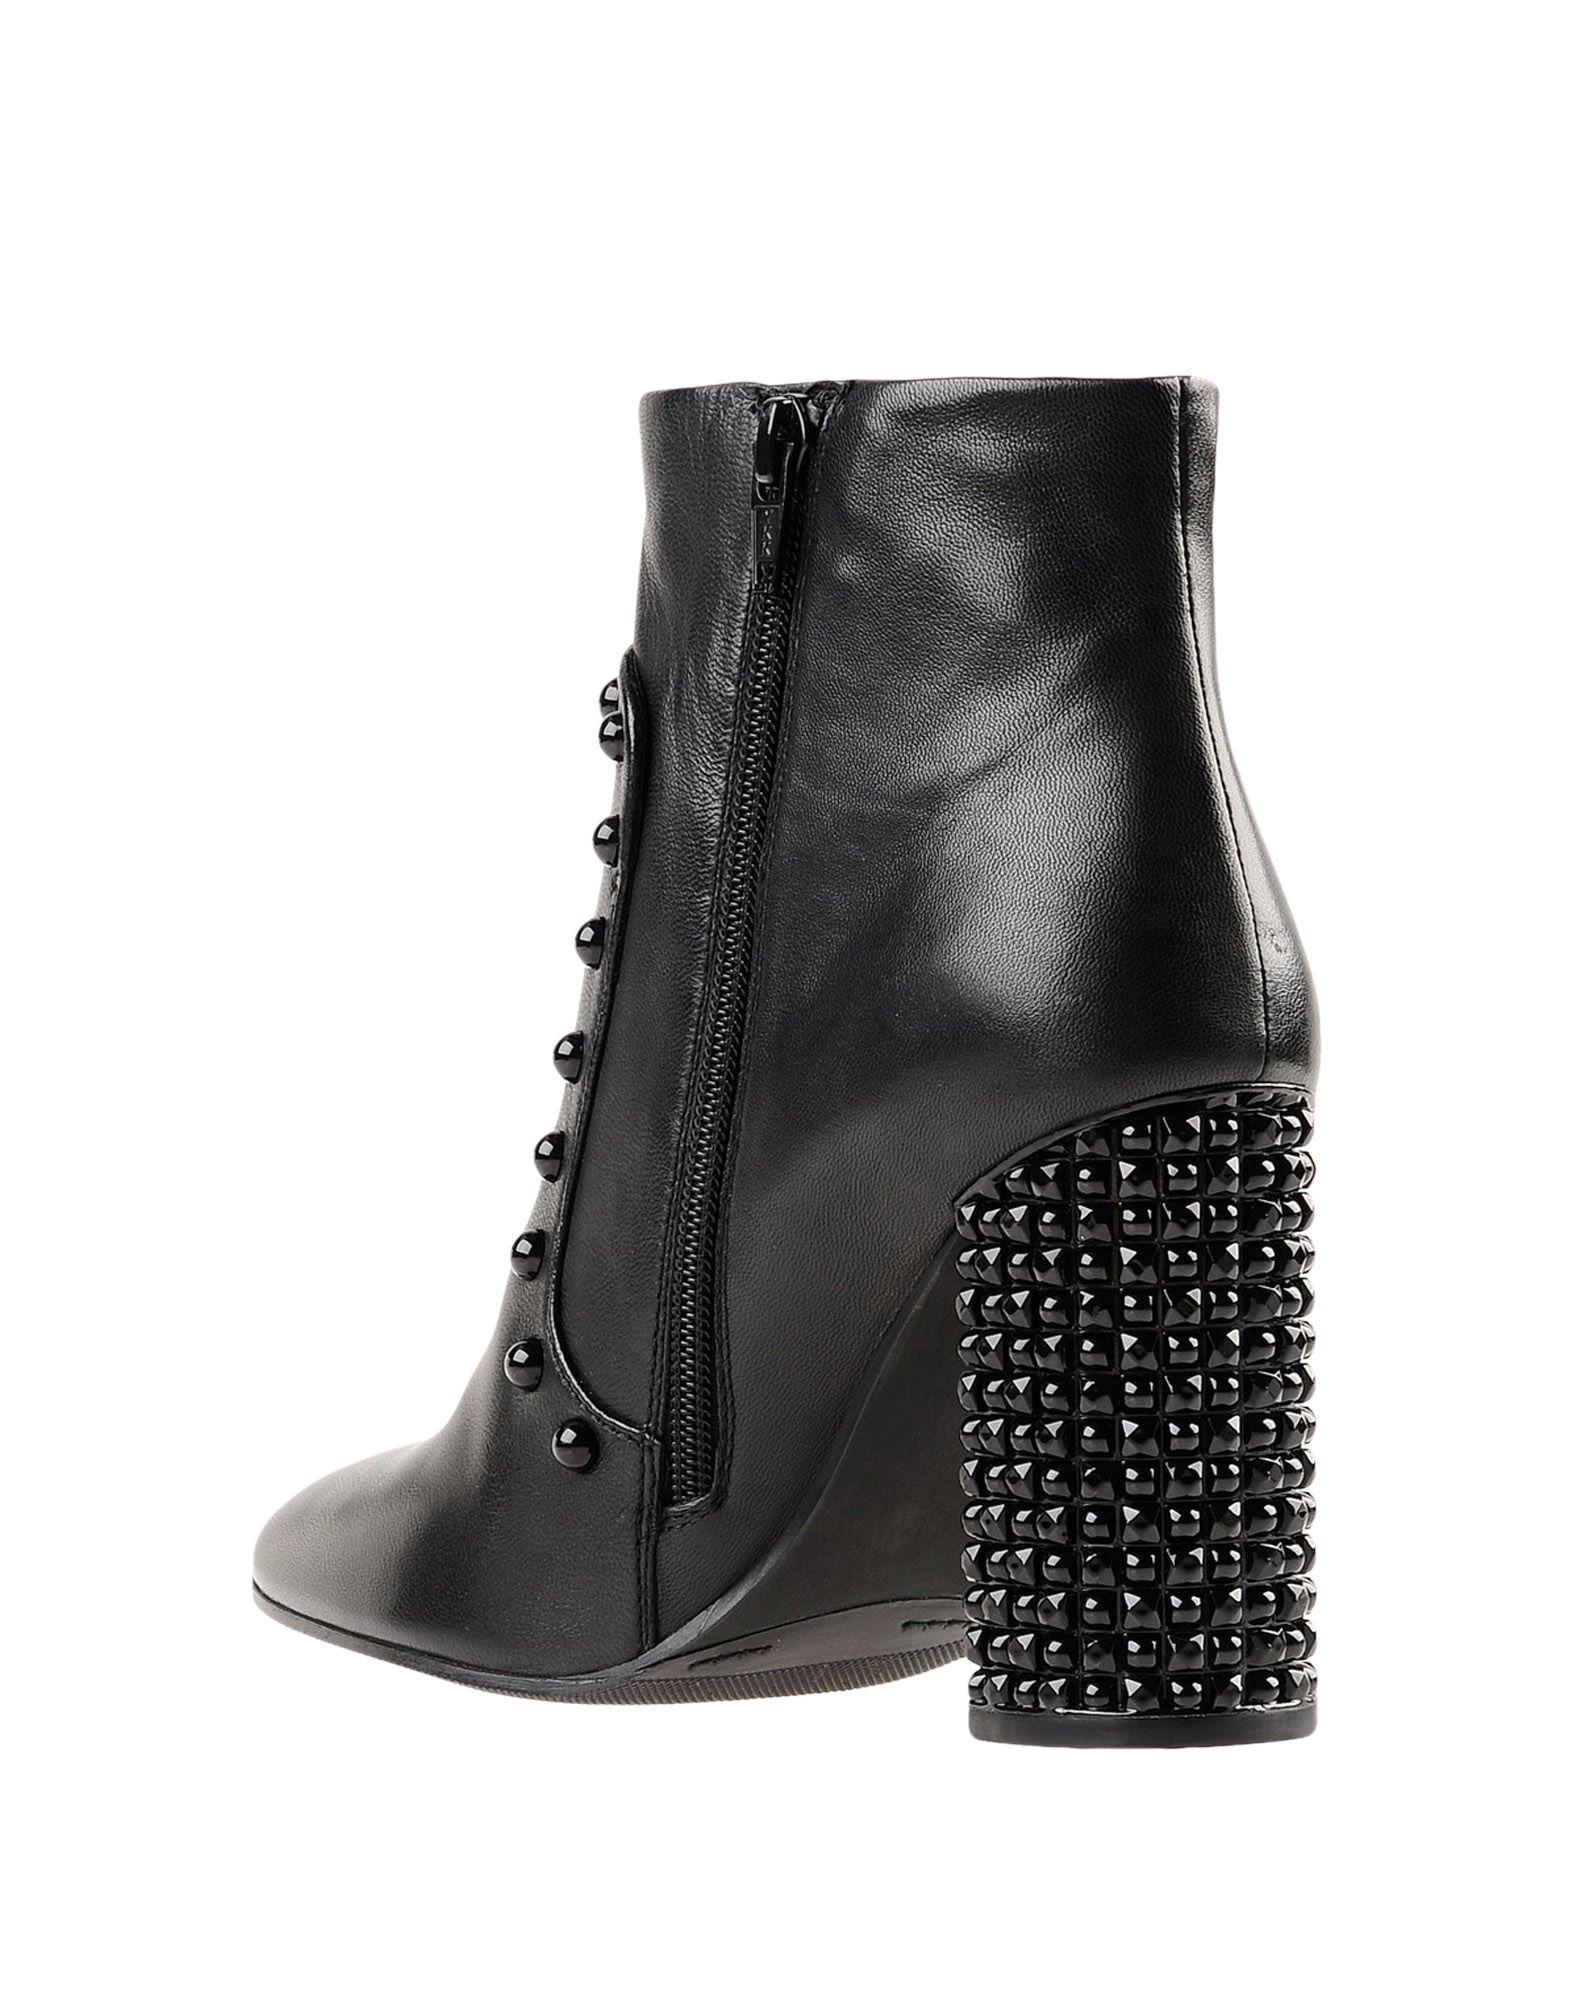 Stilvolle billige Schuhe Bruno Premi Premi Premi Stiefelette Damen  11538668CR 79d118